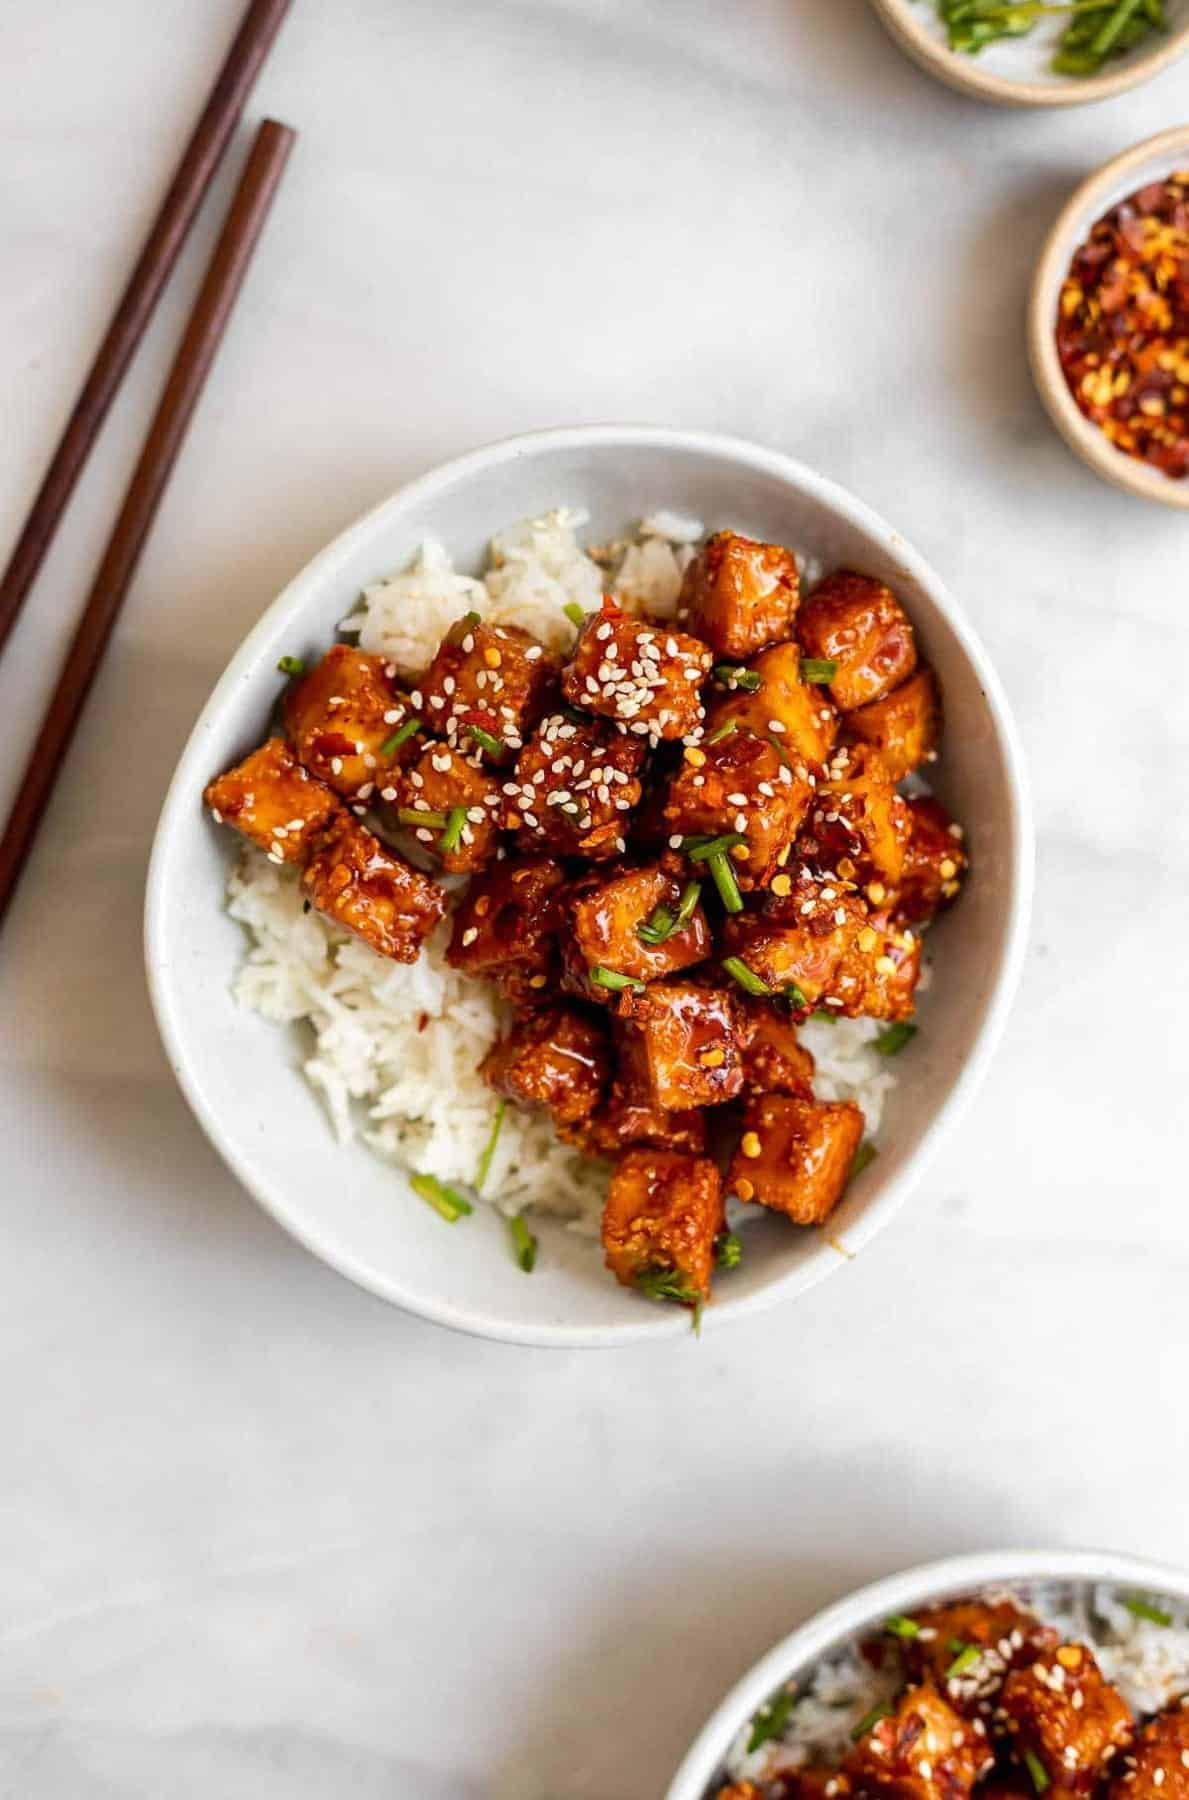 vegan teriyaki tofu in two bowls on top of rice with chopsticks.